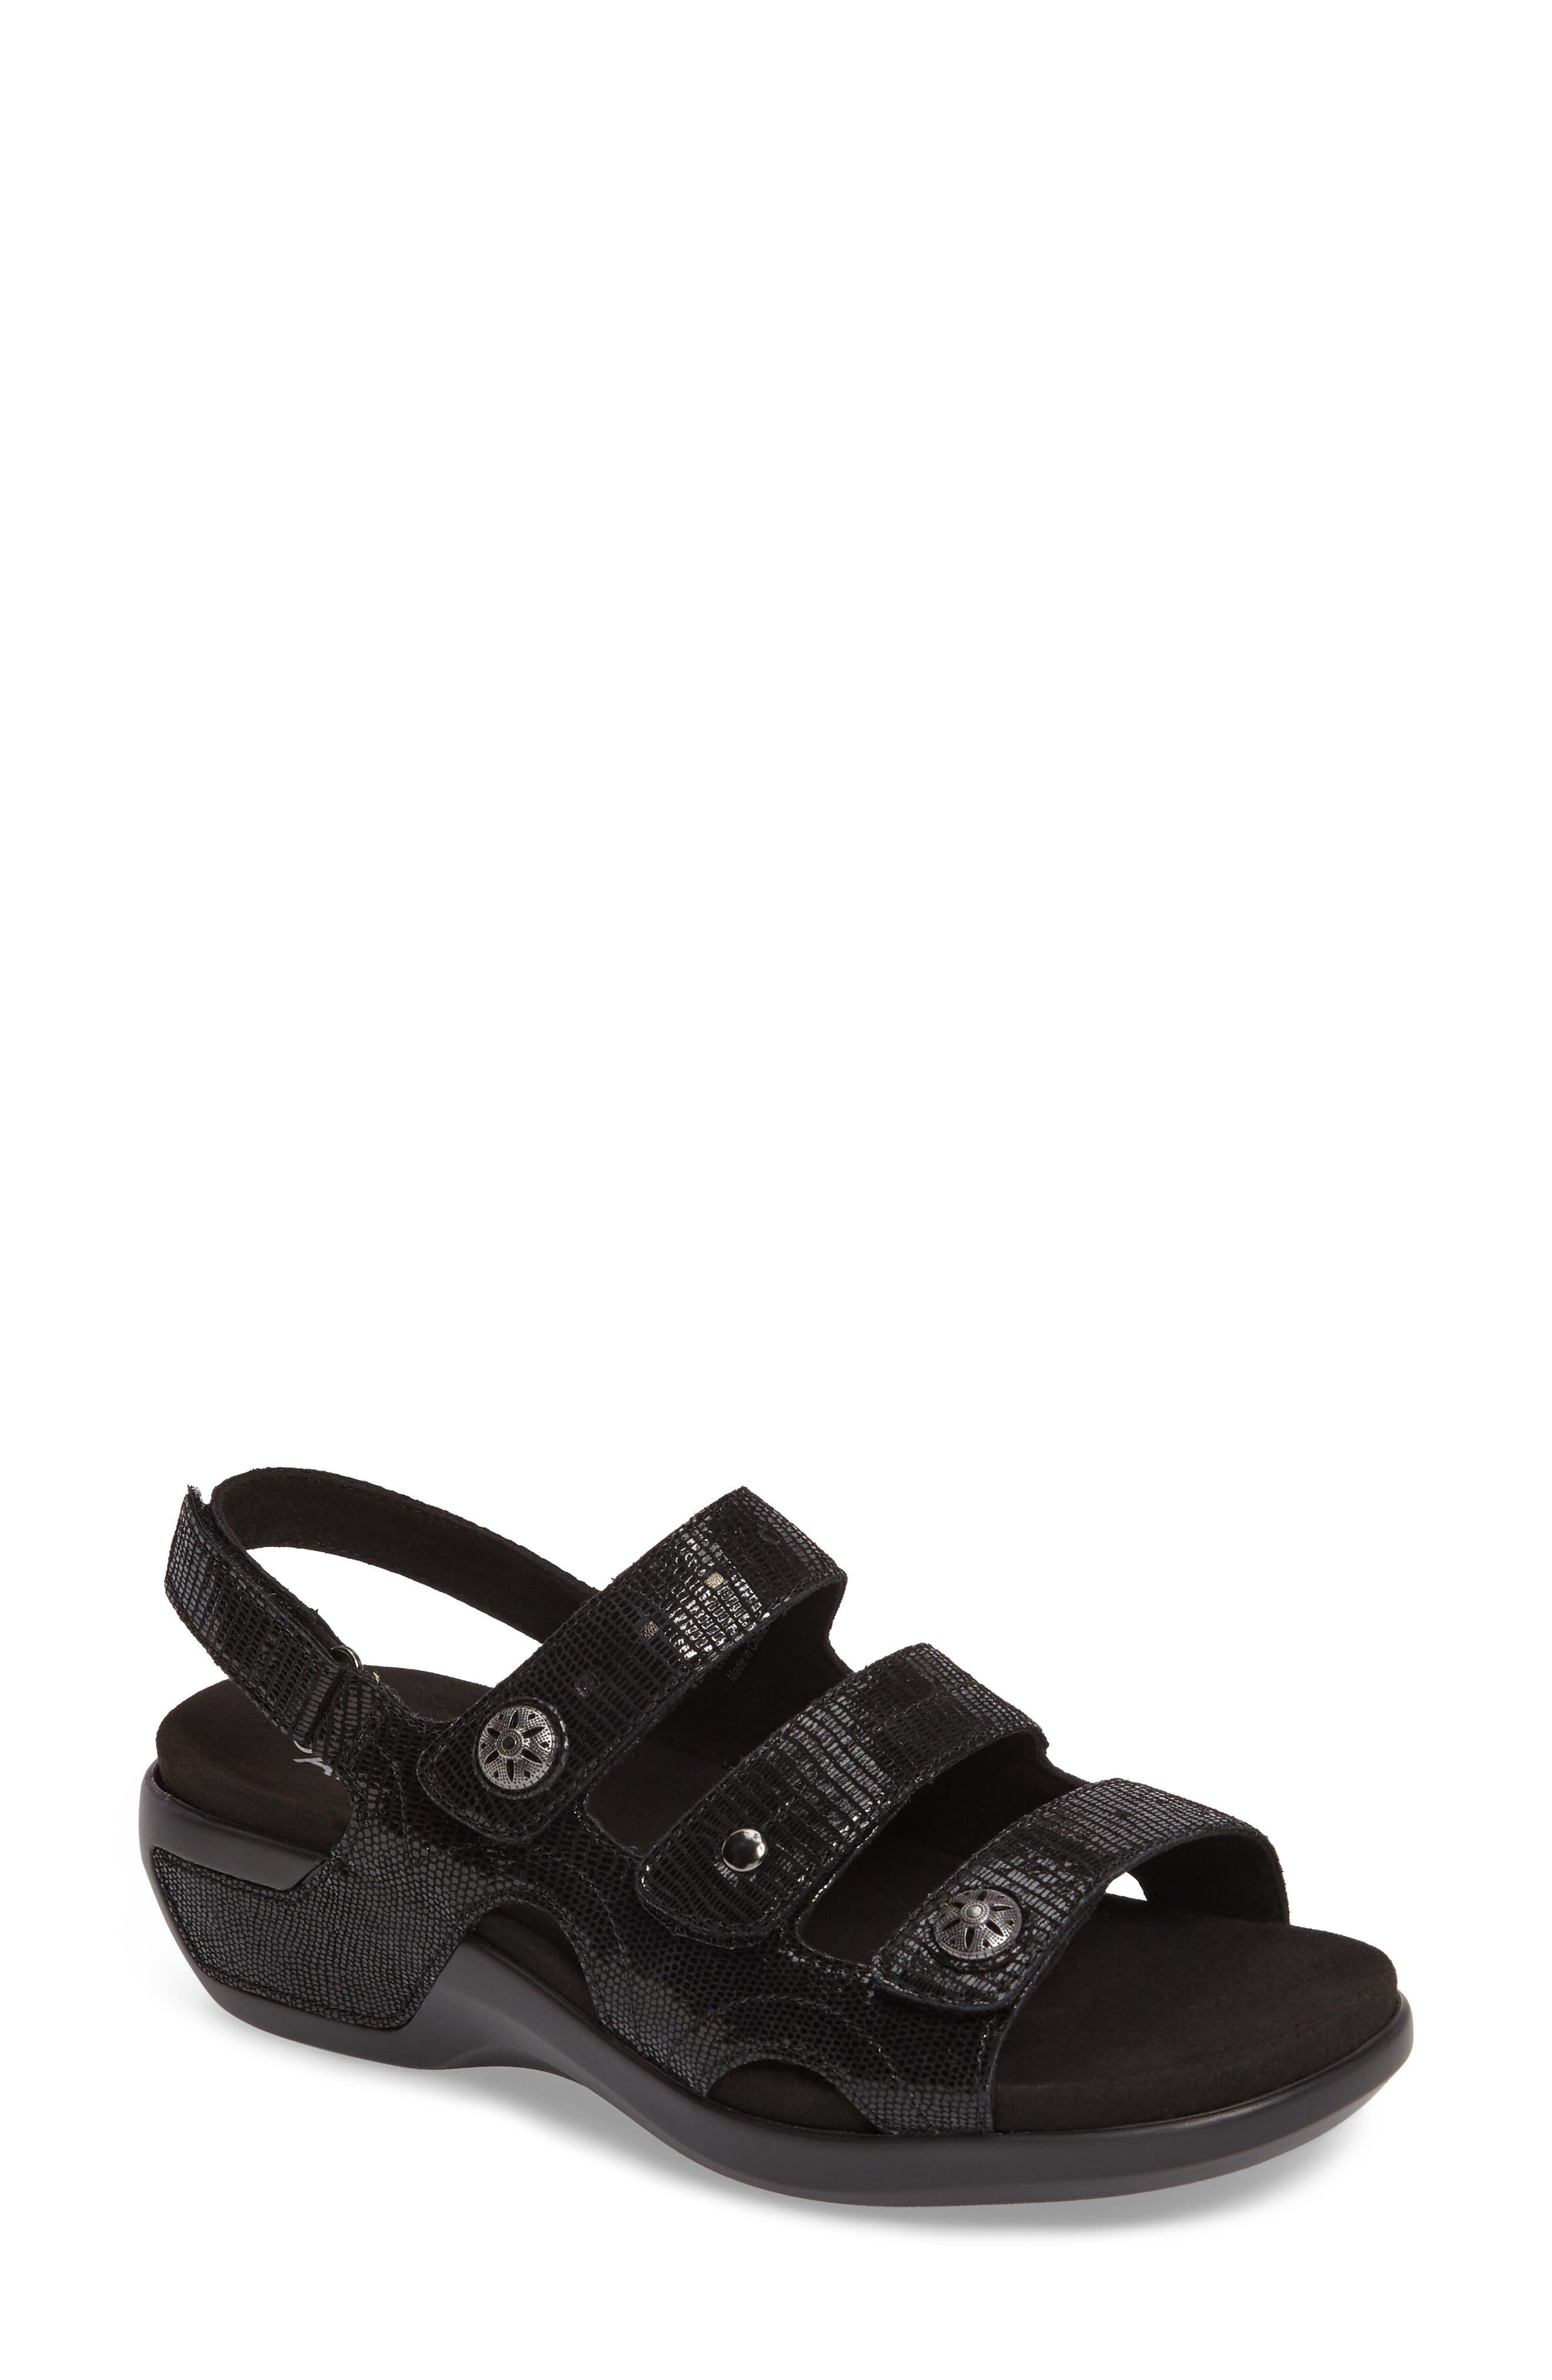 PC Wedge Sandal,                         Main,                         color, BLACK FABRIC